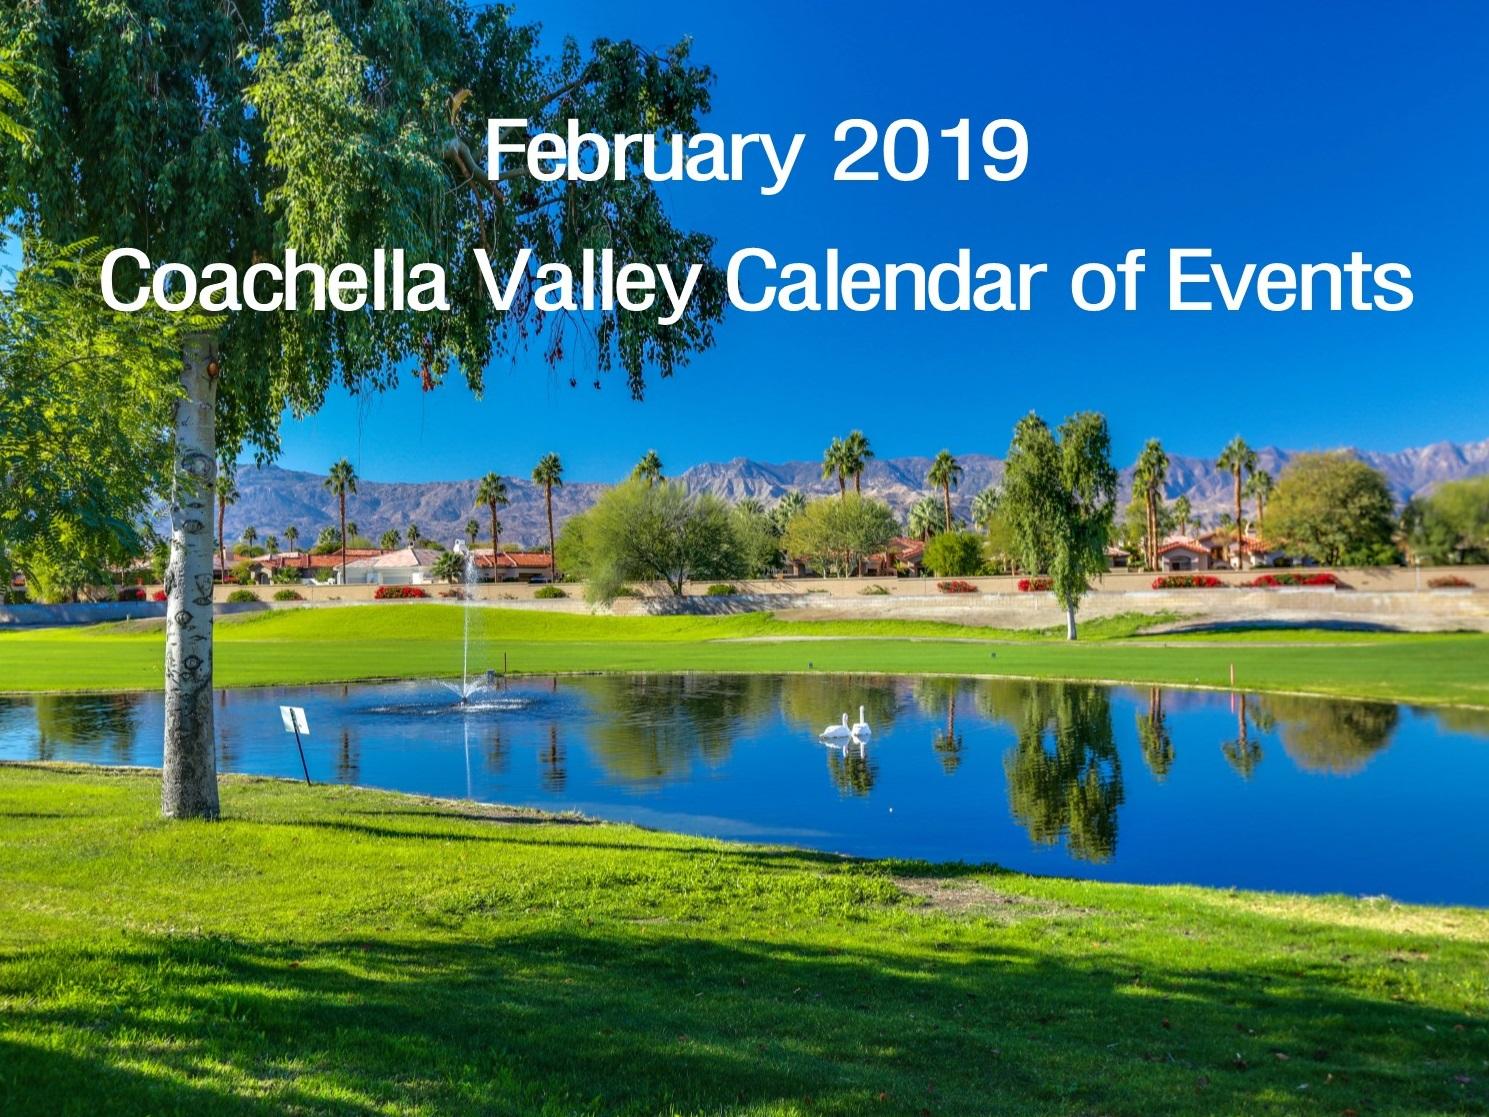 Cochella Valley Events Calendar February 2019 February 2019 Coachella Valley Calendar Of Events